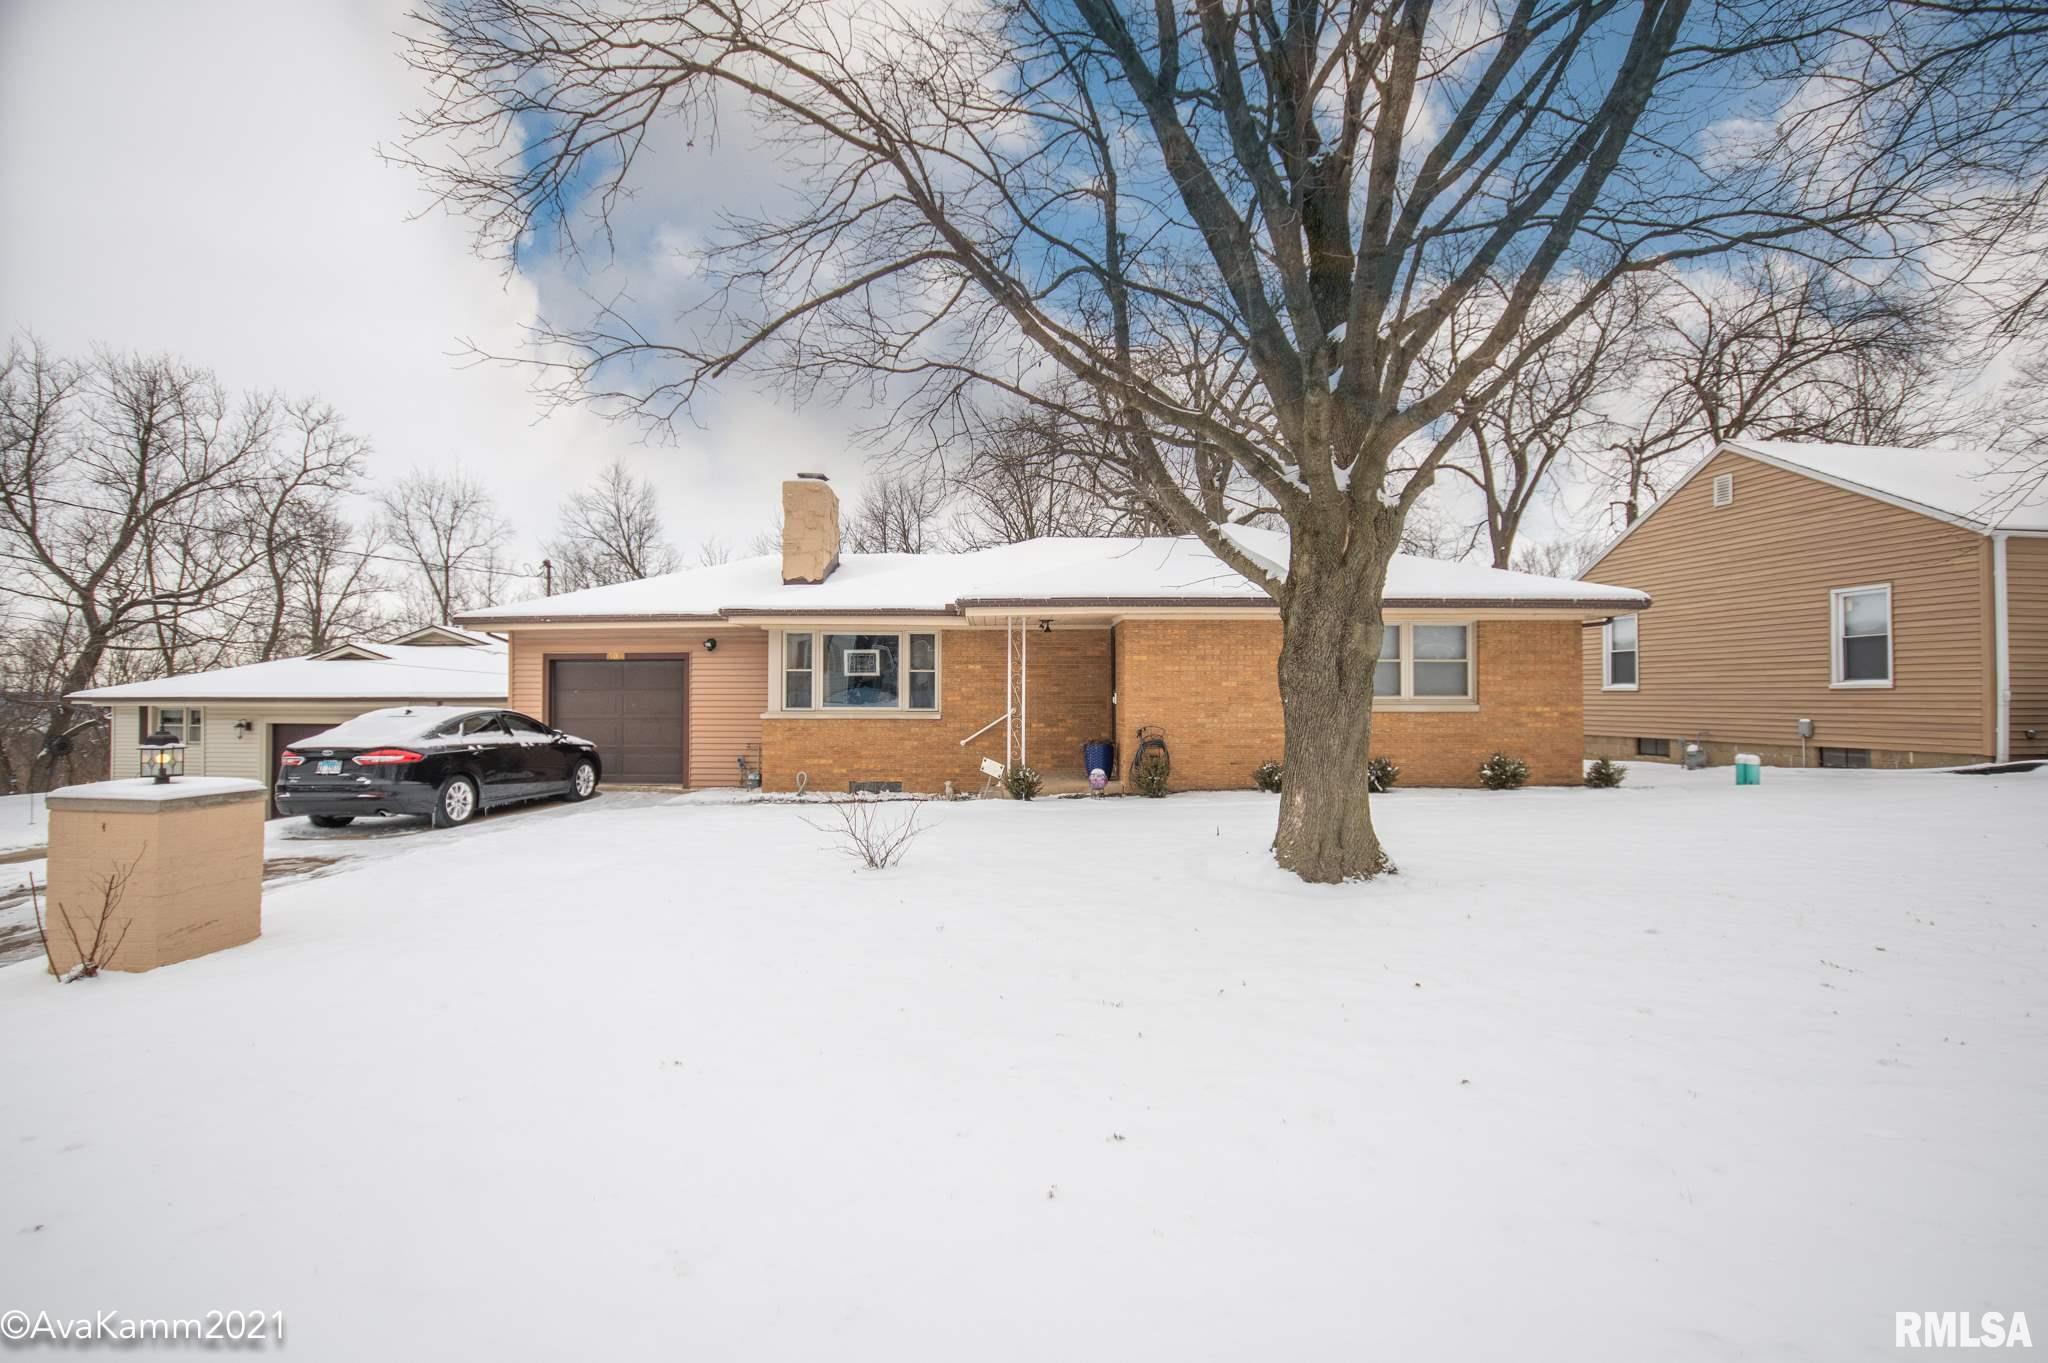 305 PARK Property Photo - Creve Coeur, IL real estate listing